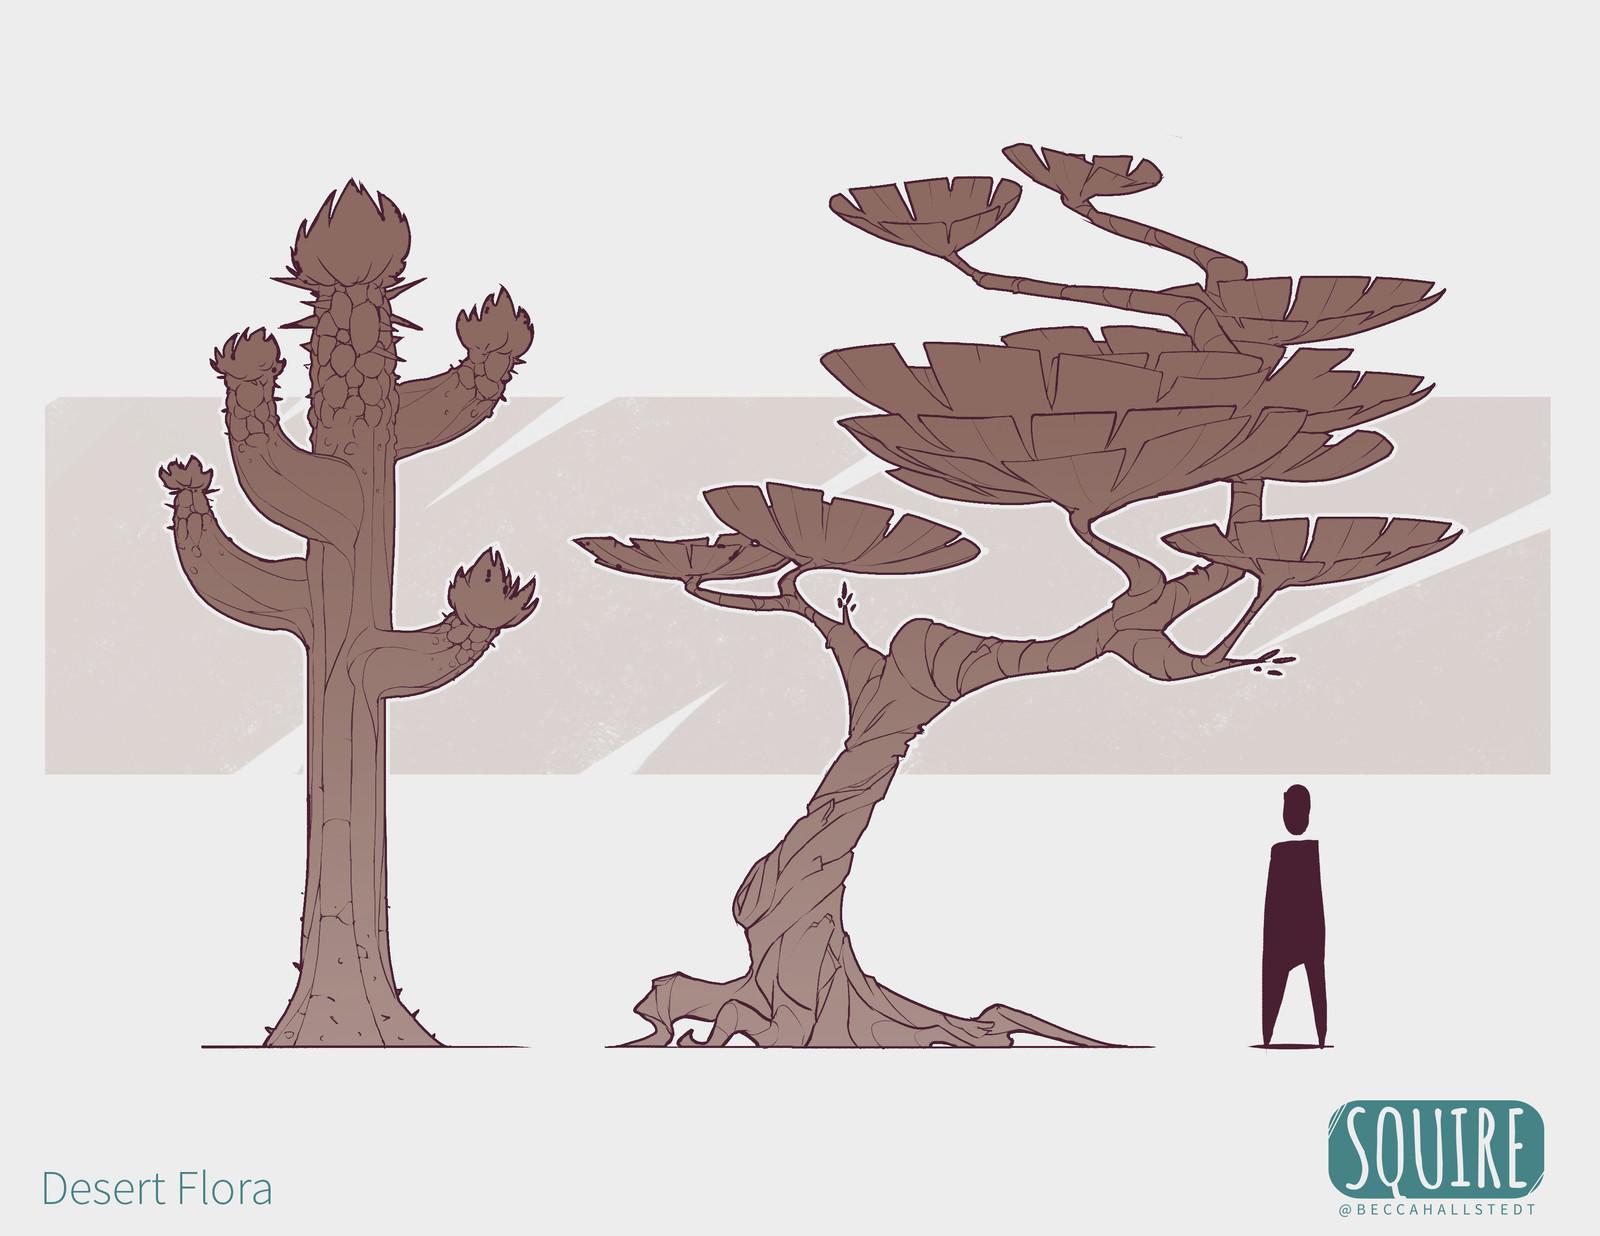 SQUIRE: Desert Biome Flora